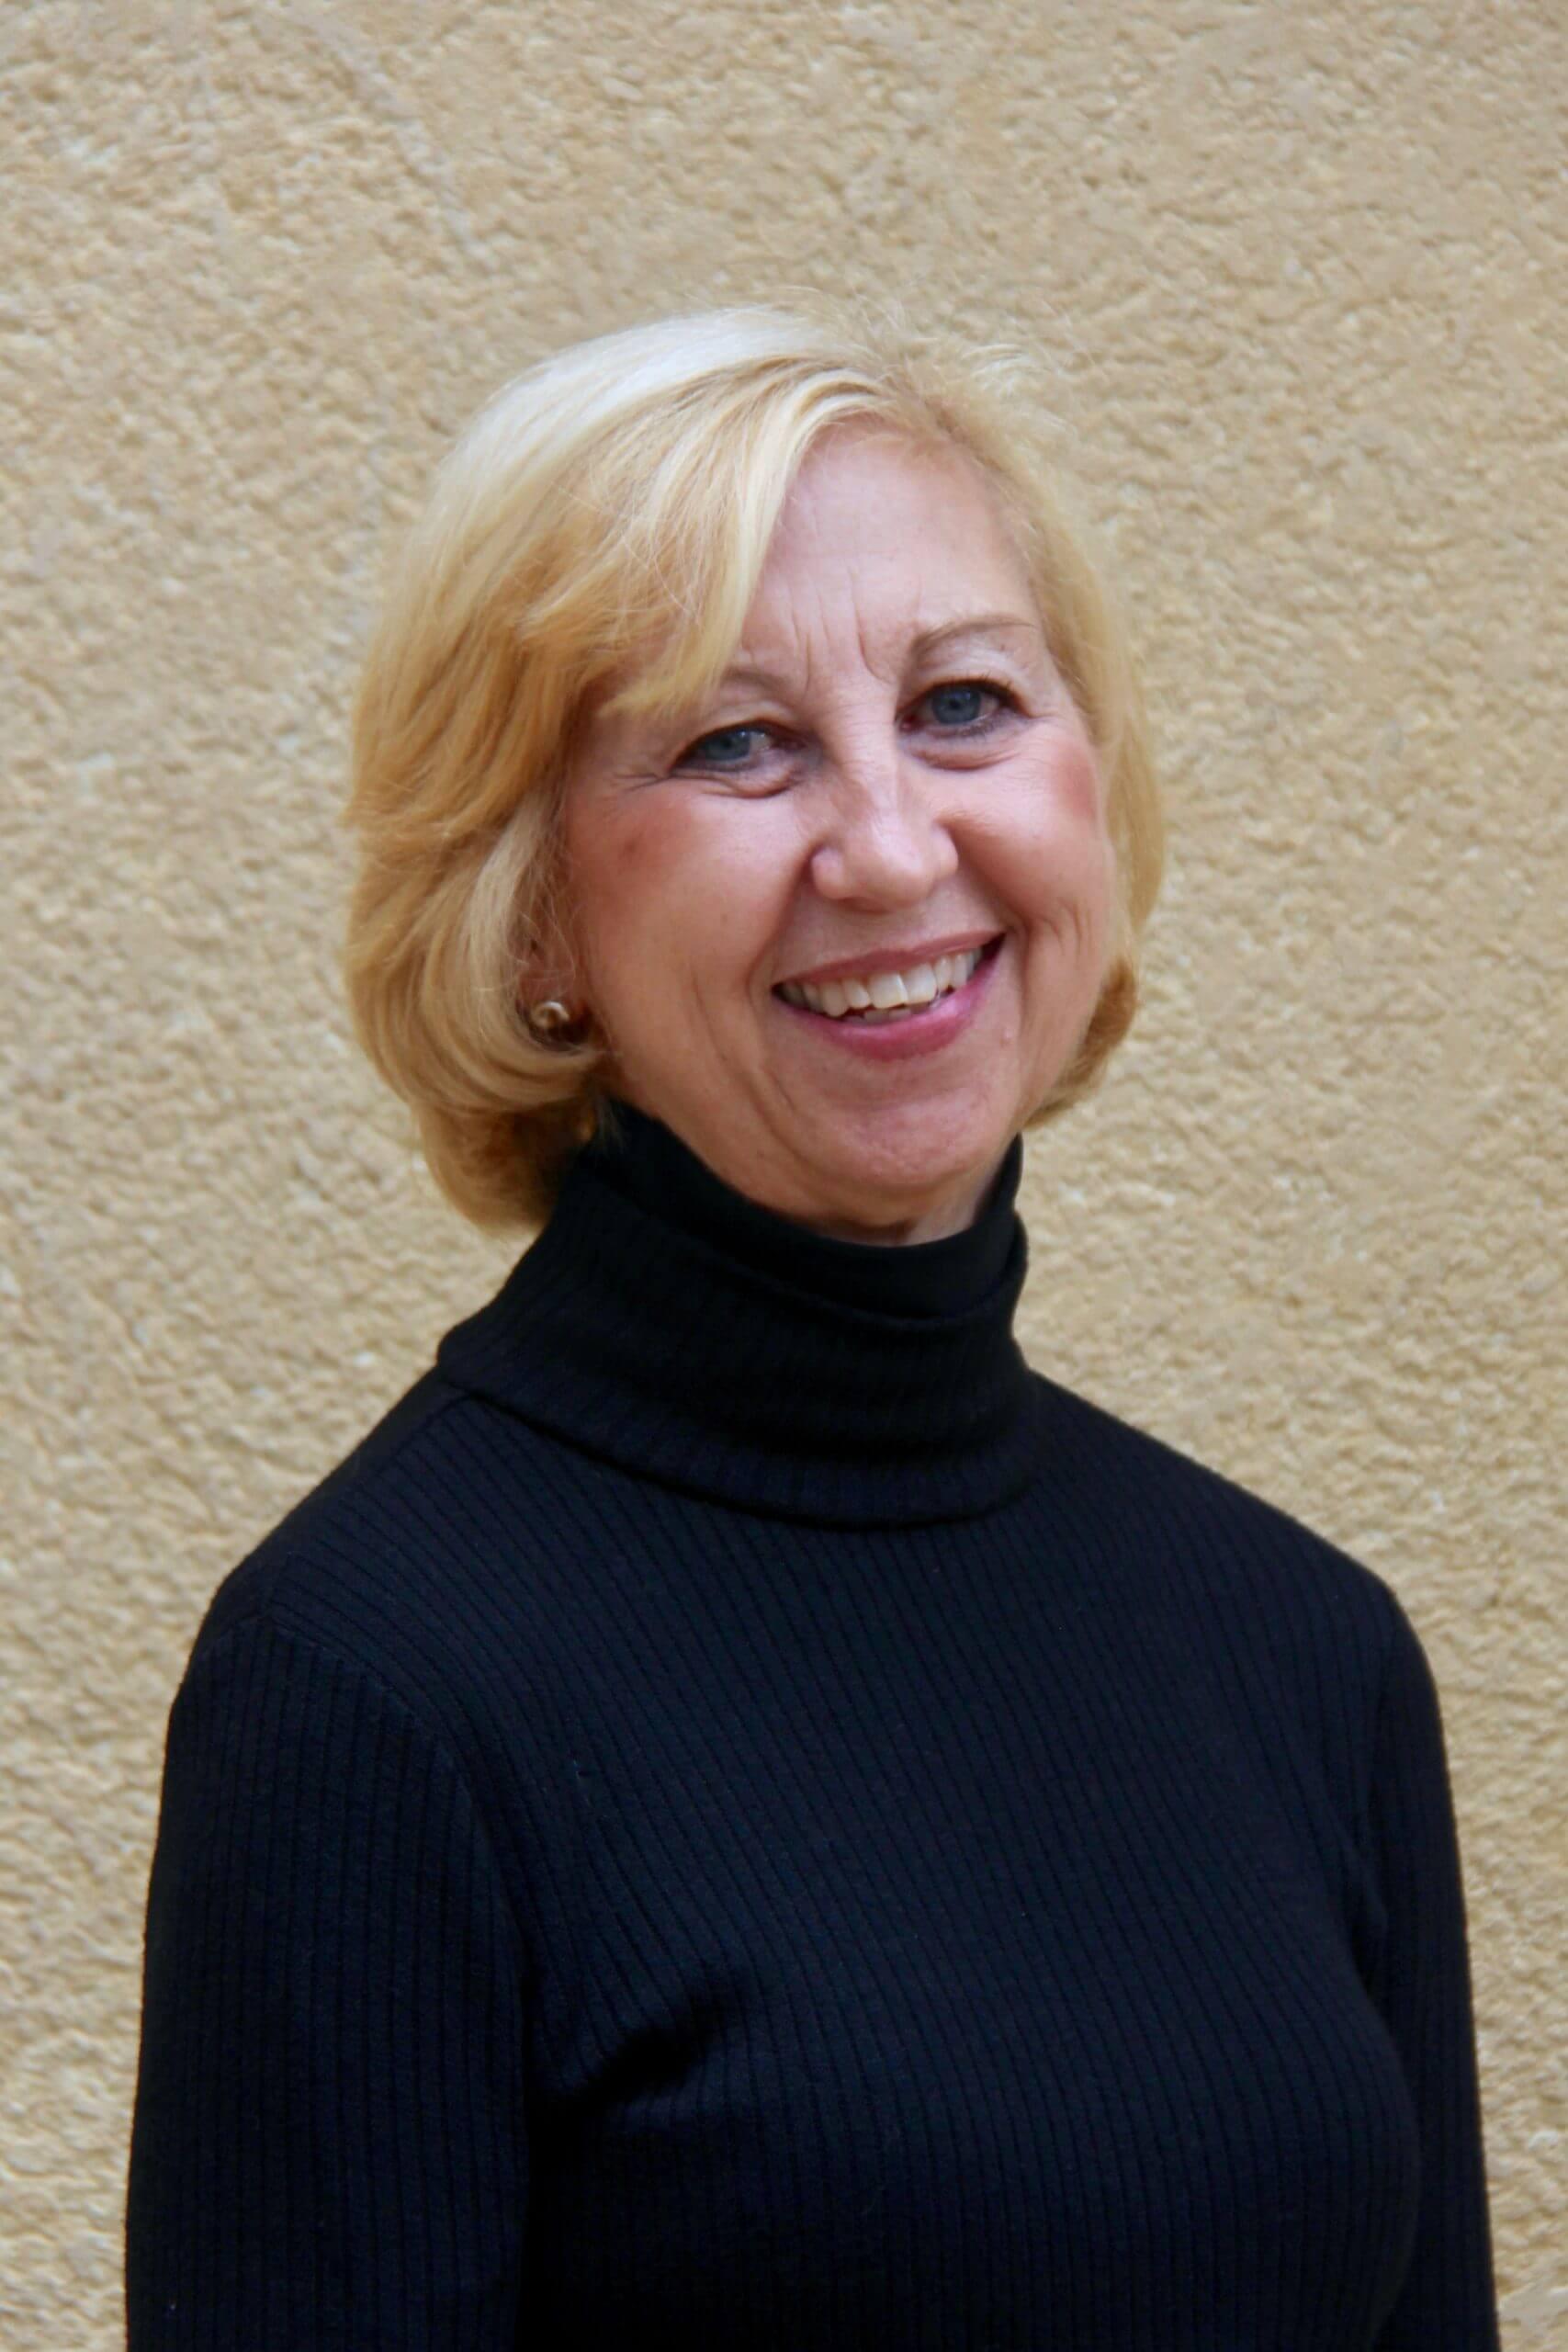 Jan Kaufman - Director of Development, Head of Operations